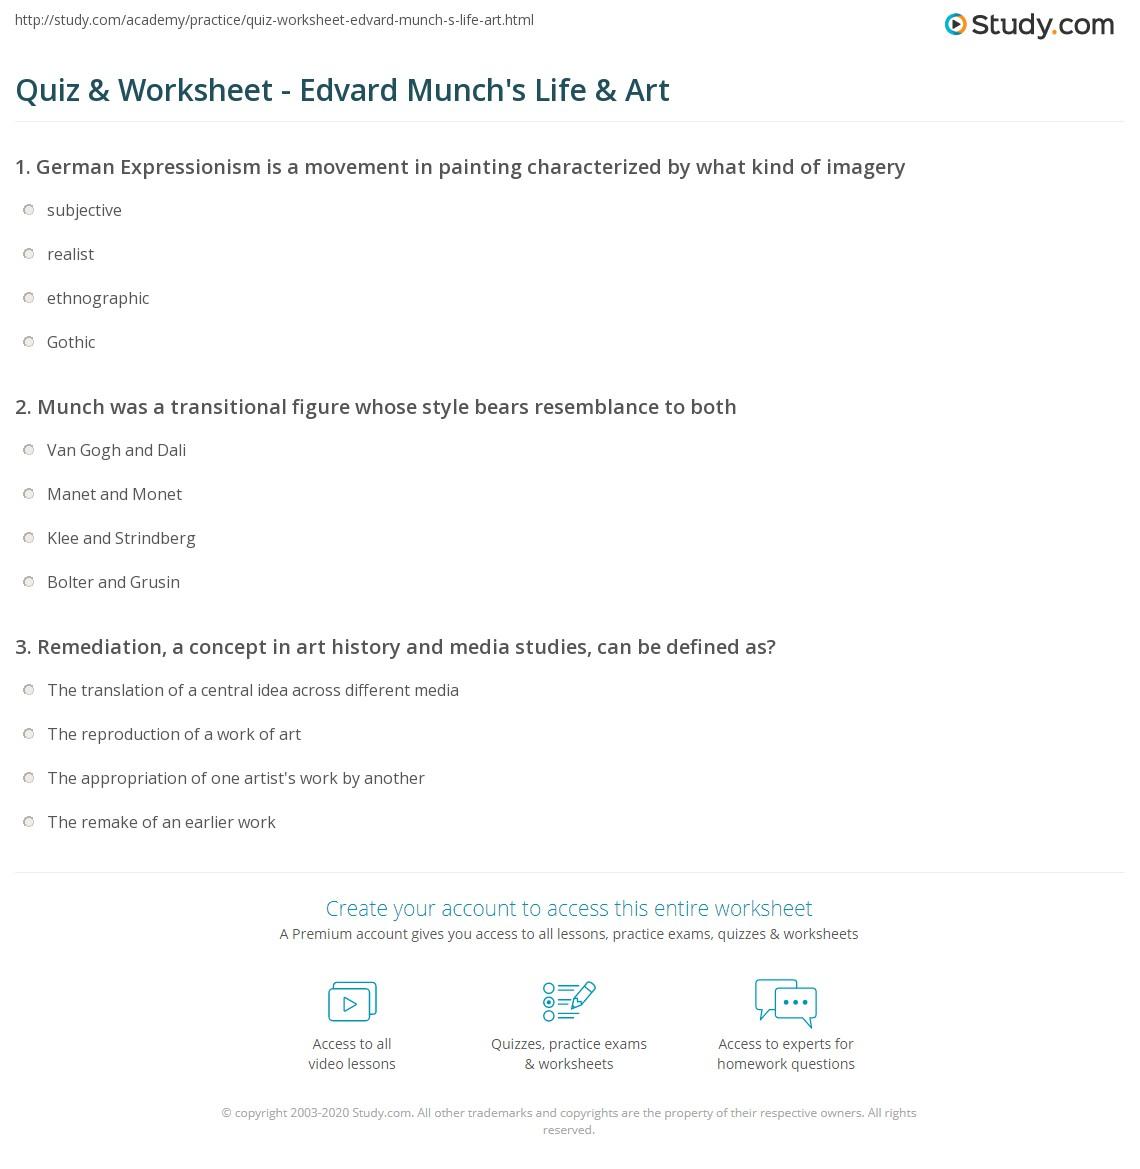 Quiz & Worksheet - Edvard Munch's Life & Art | Study com